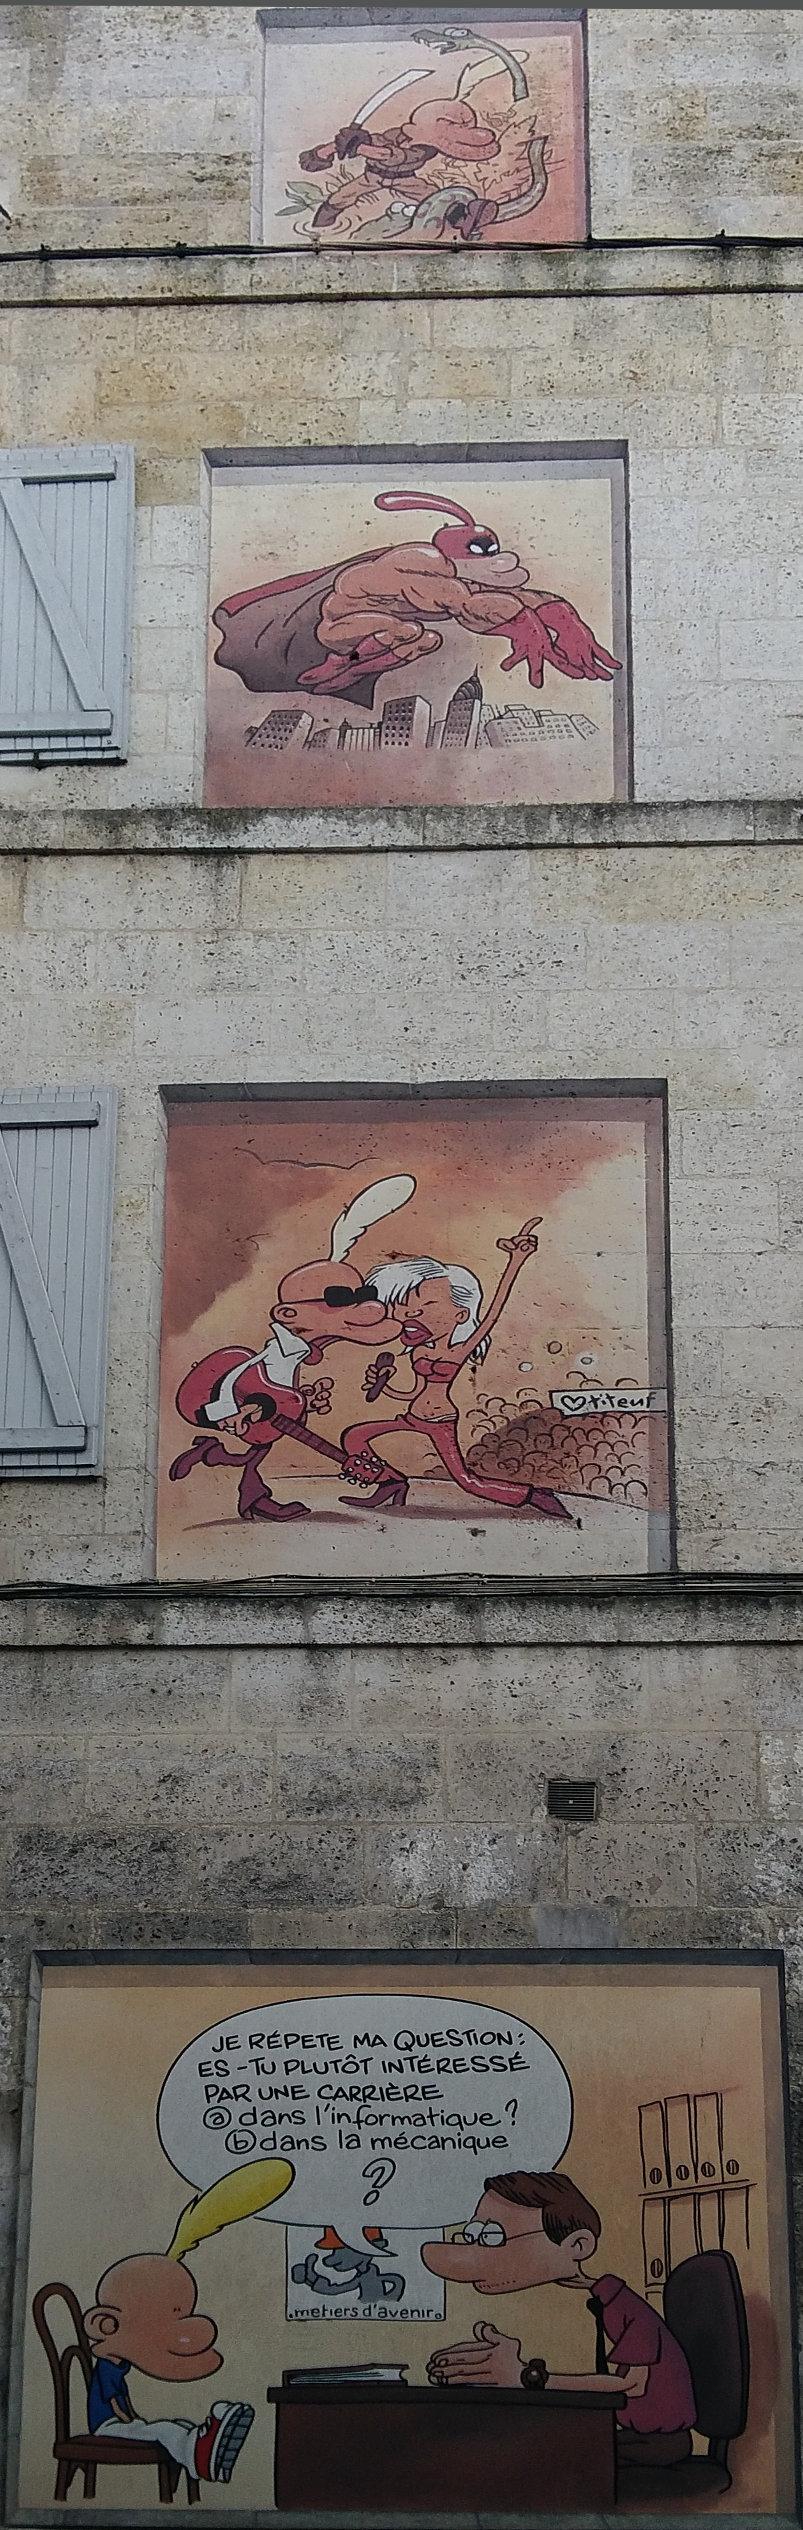 Street Art, 45 Boulevard Pasteur, Angoulême, France